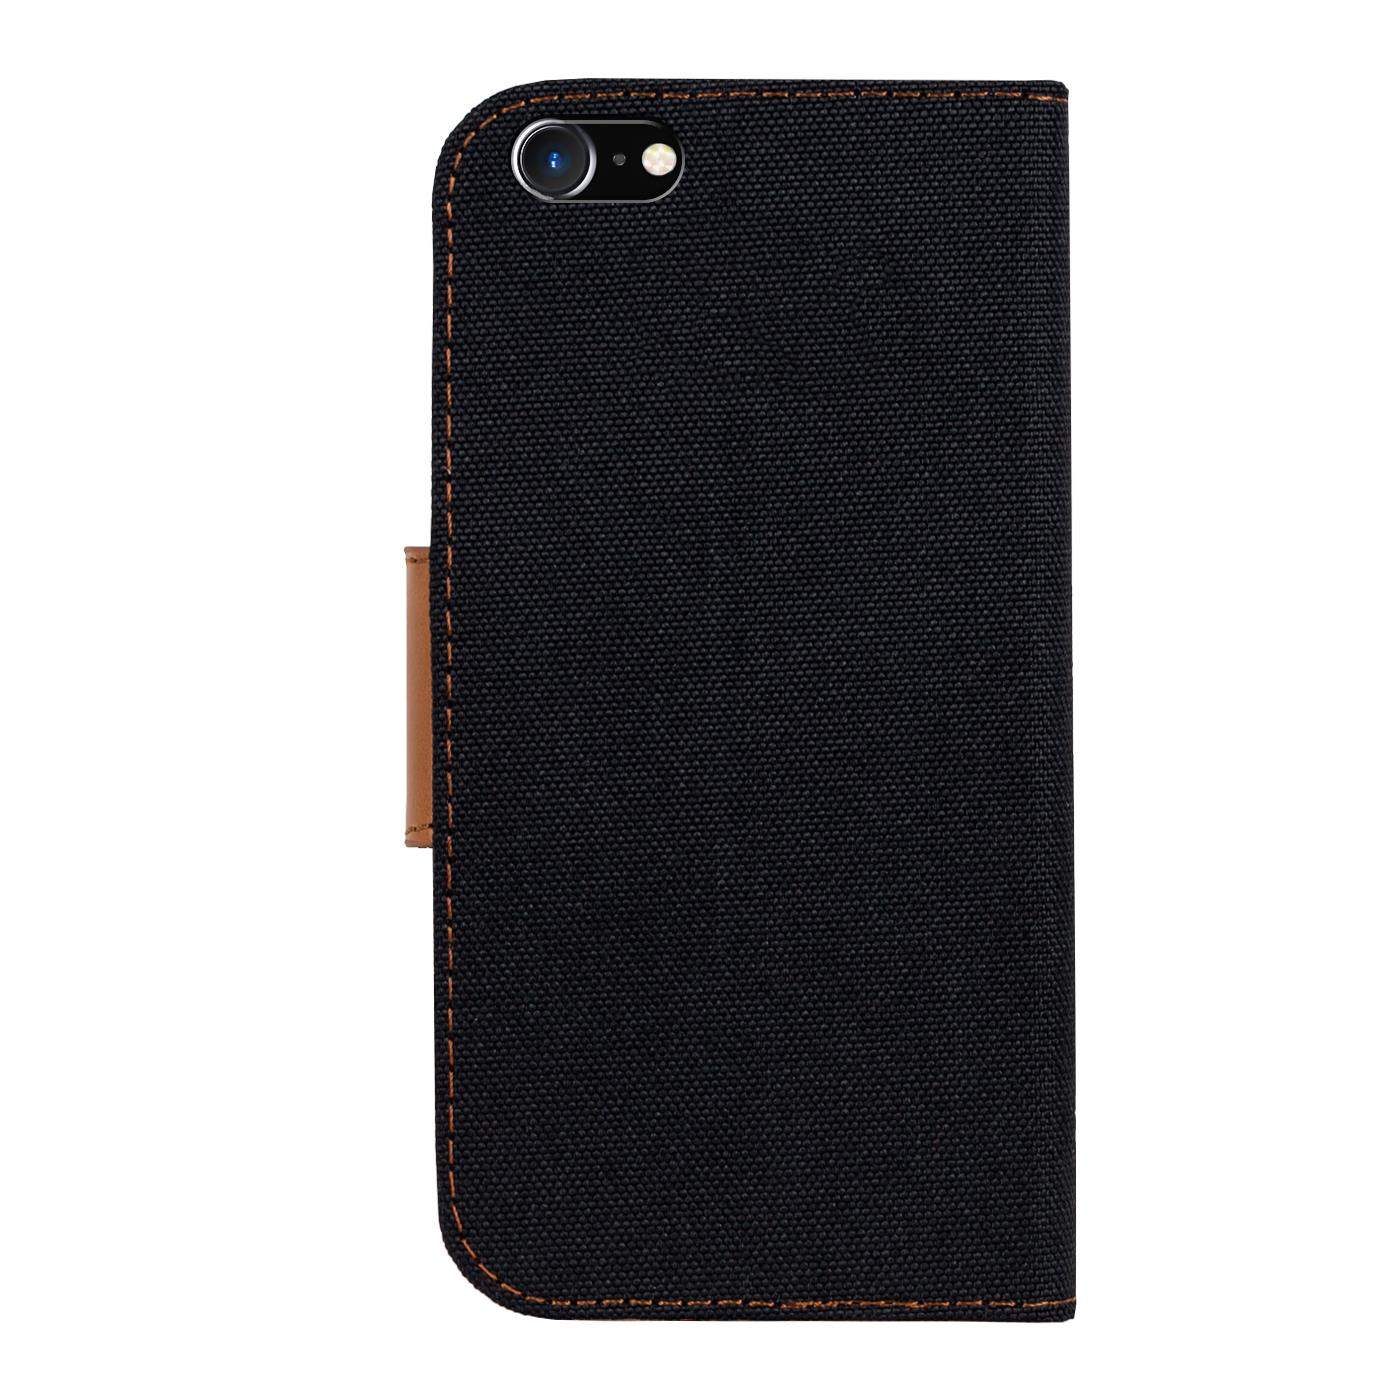 apple iphone 6 6s schutzh lle h lle flip case handy tasche. Black Bedroom Furniture Sets. Home Design Ideas